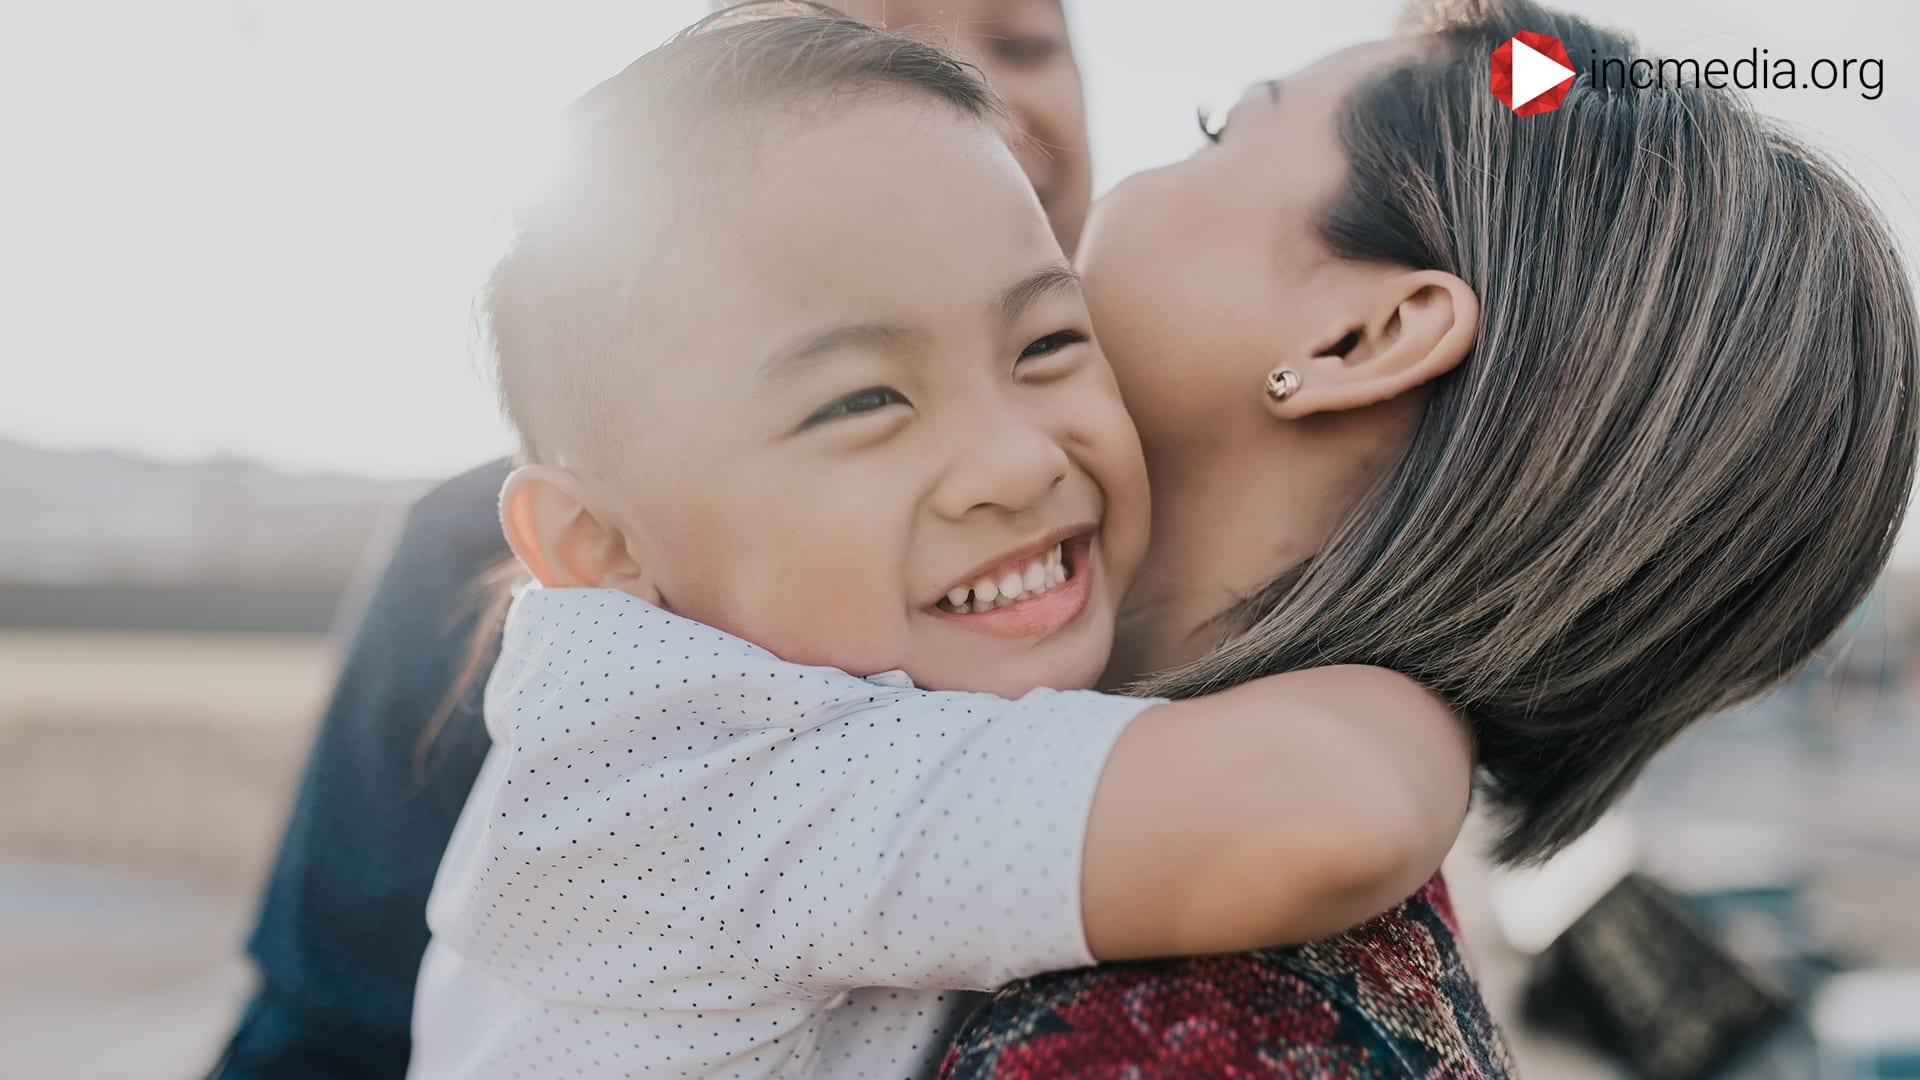 Young boy hugging mom